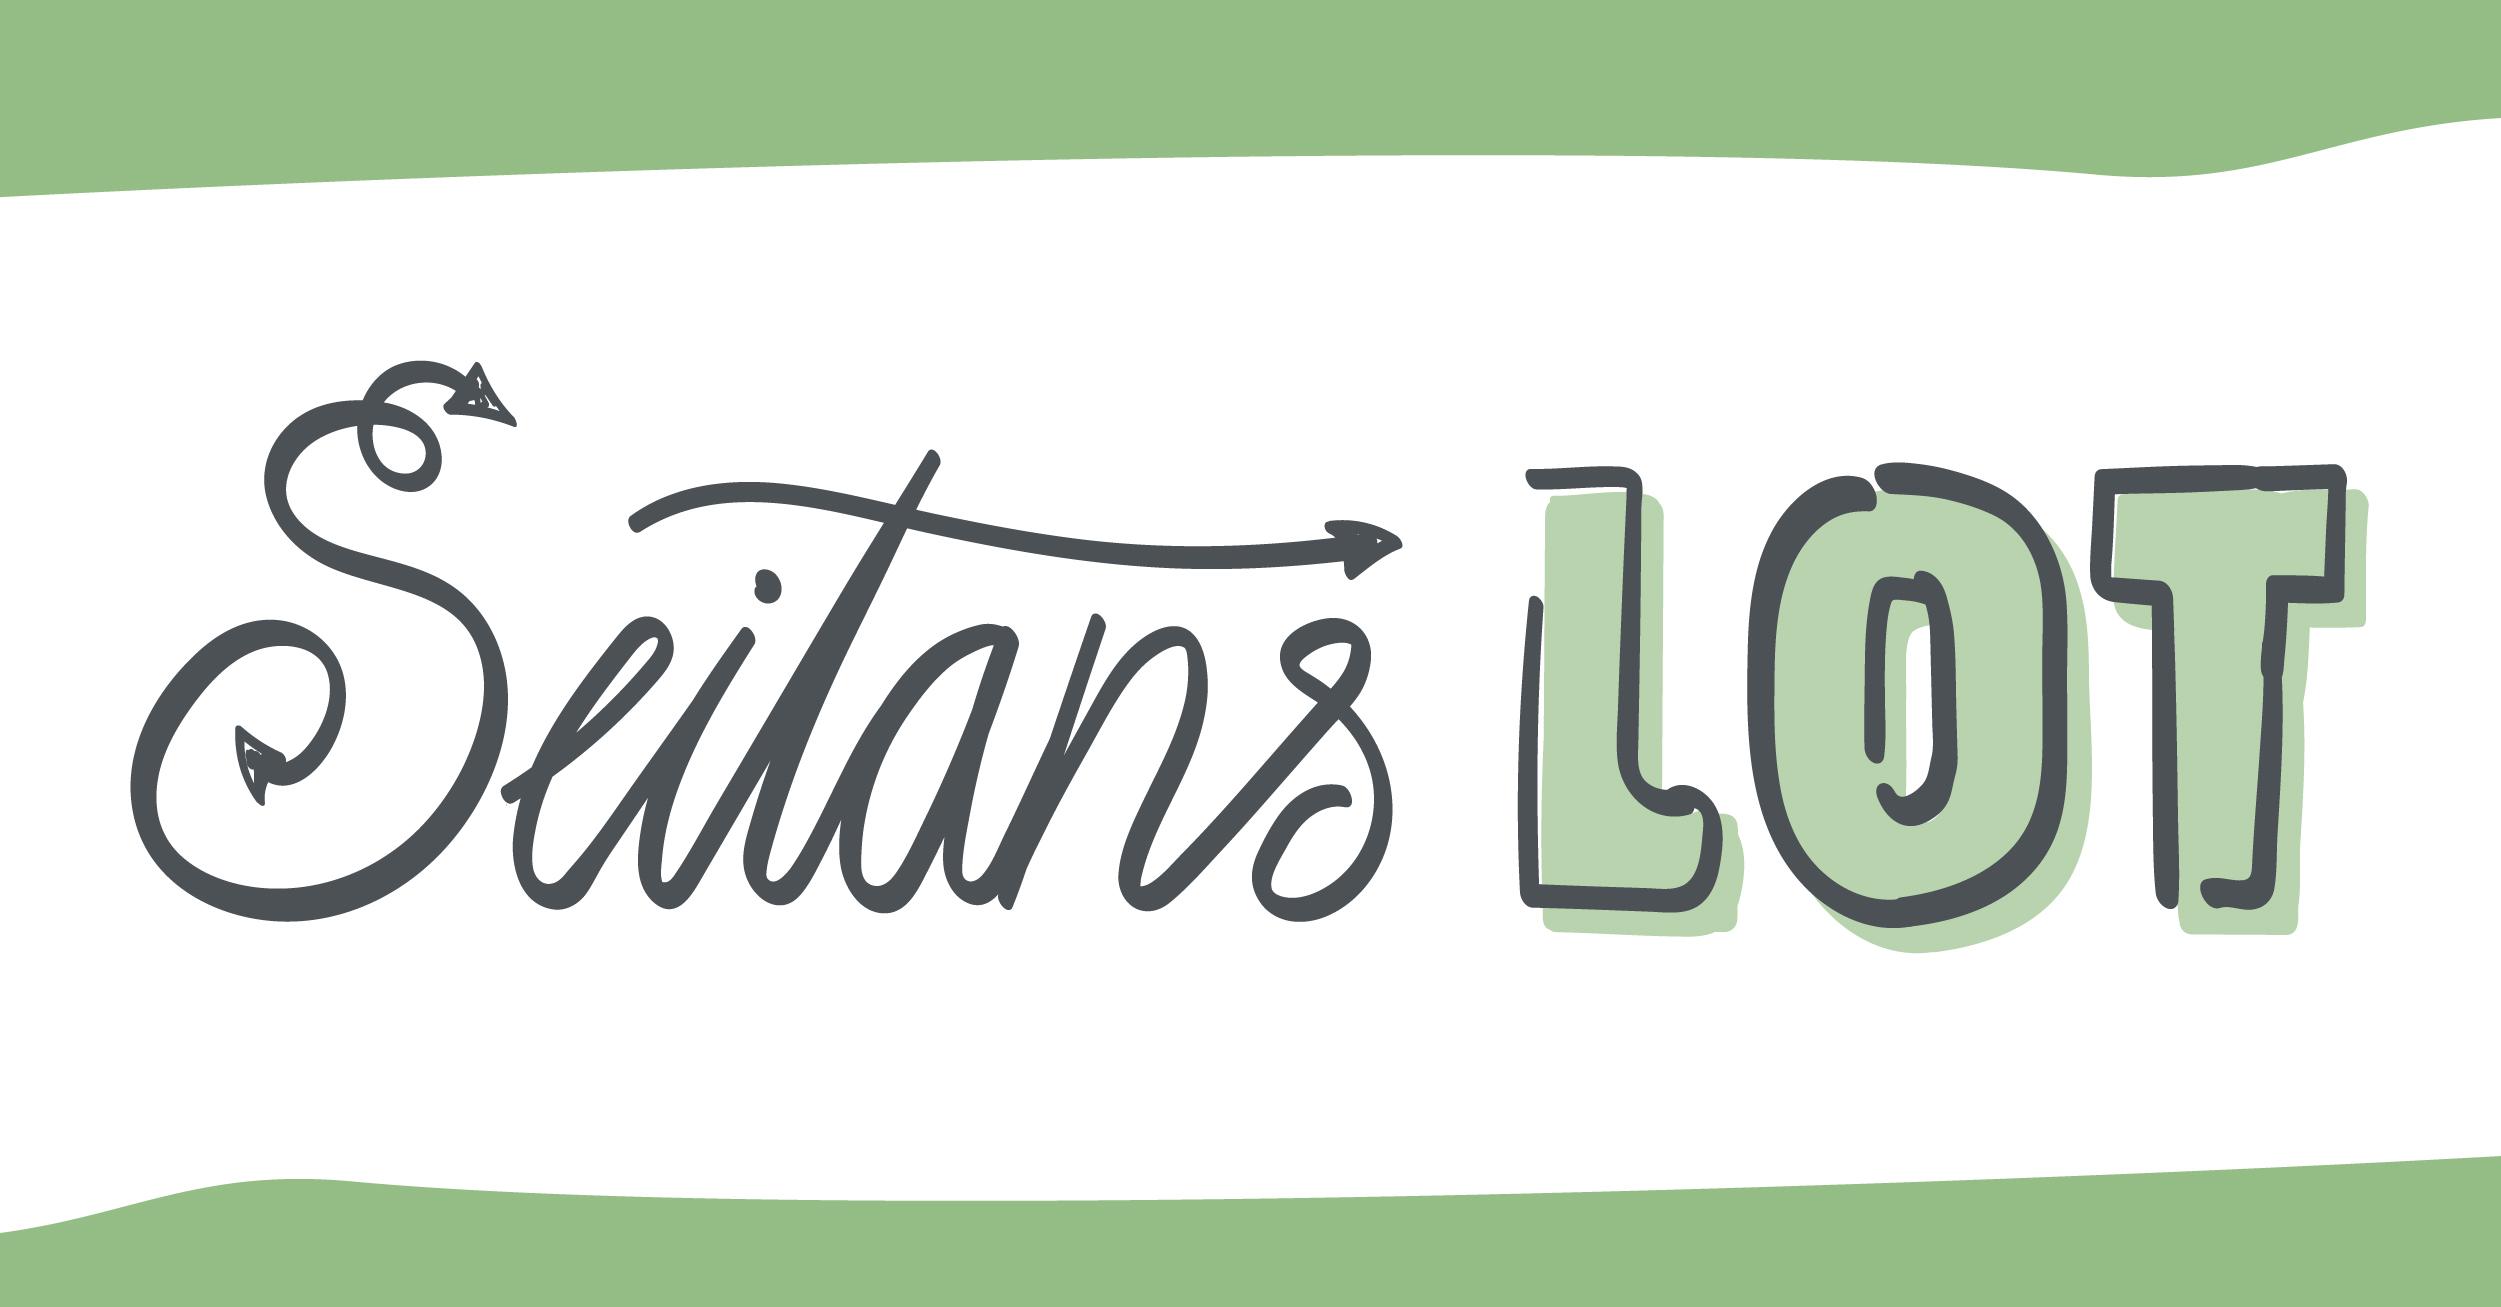 Seitans Lot Logo